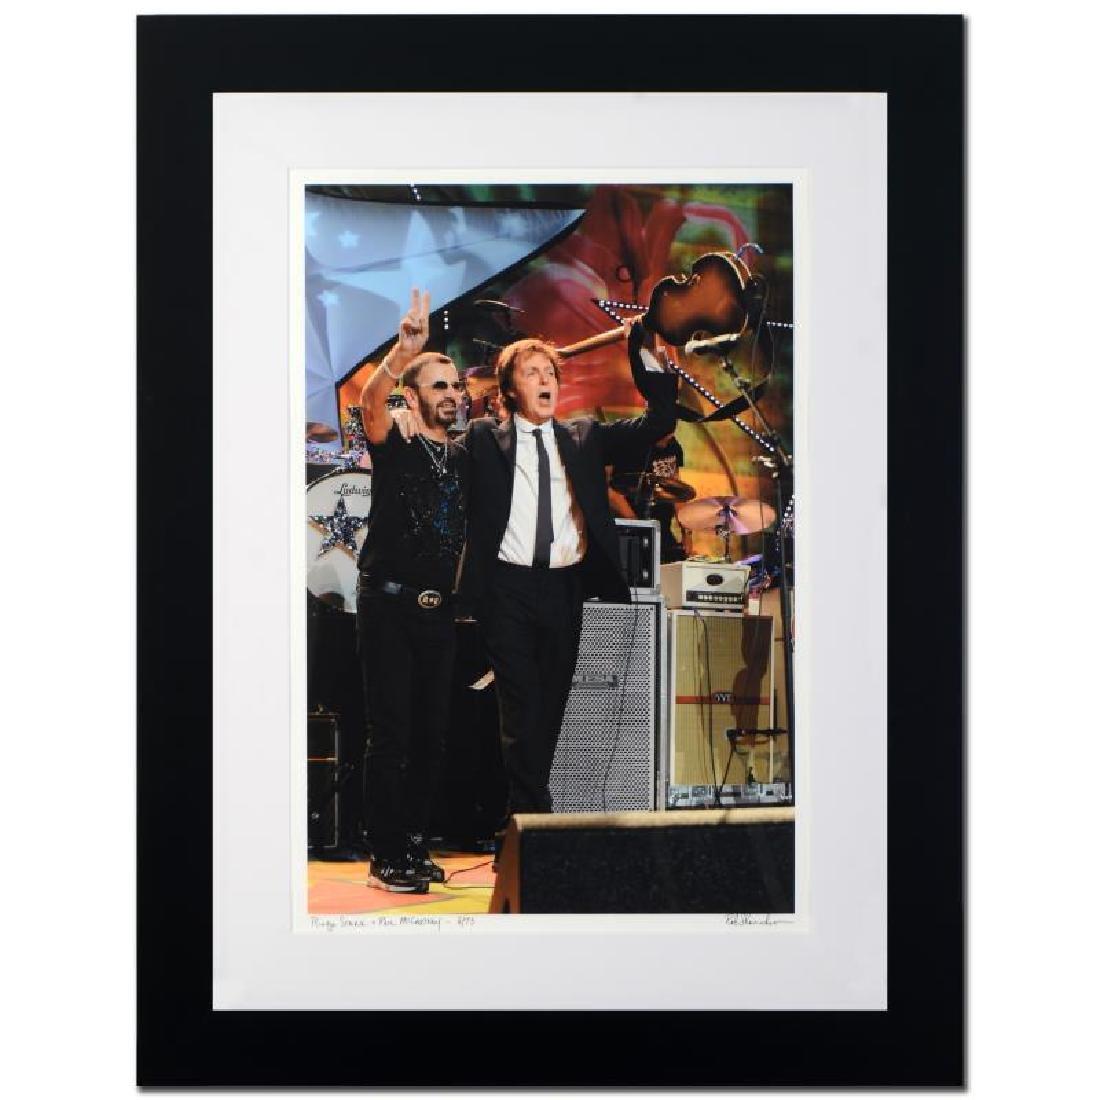 """Ringo Starr & Paul McCartney"" Limited Edition Giclee - 3"